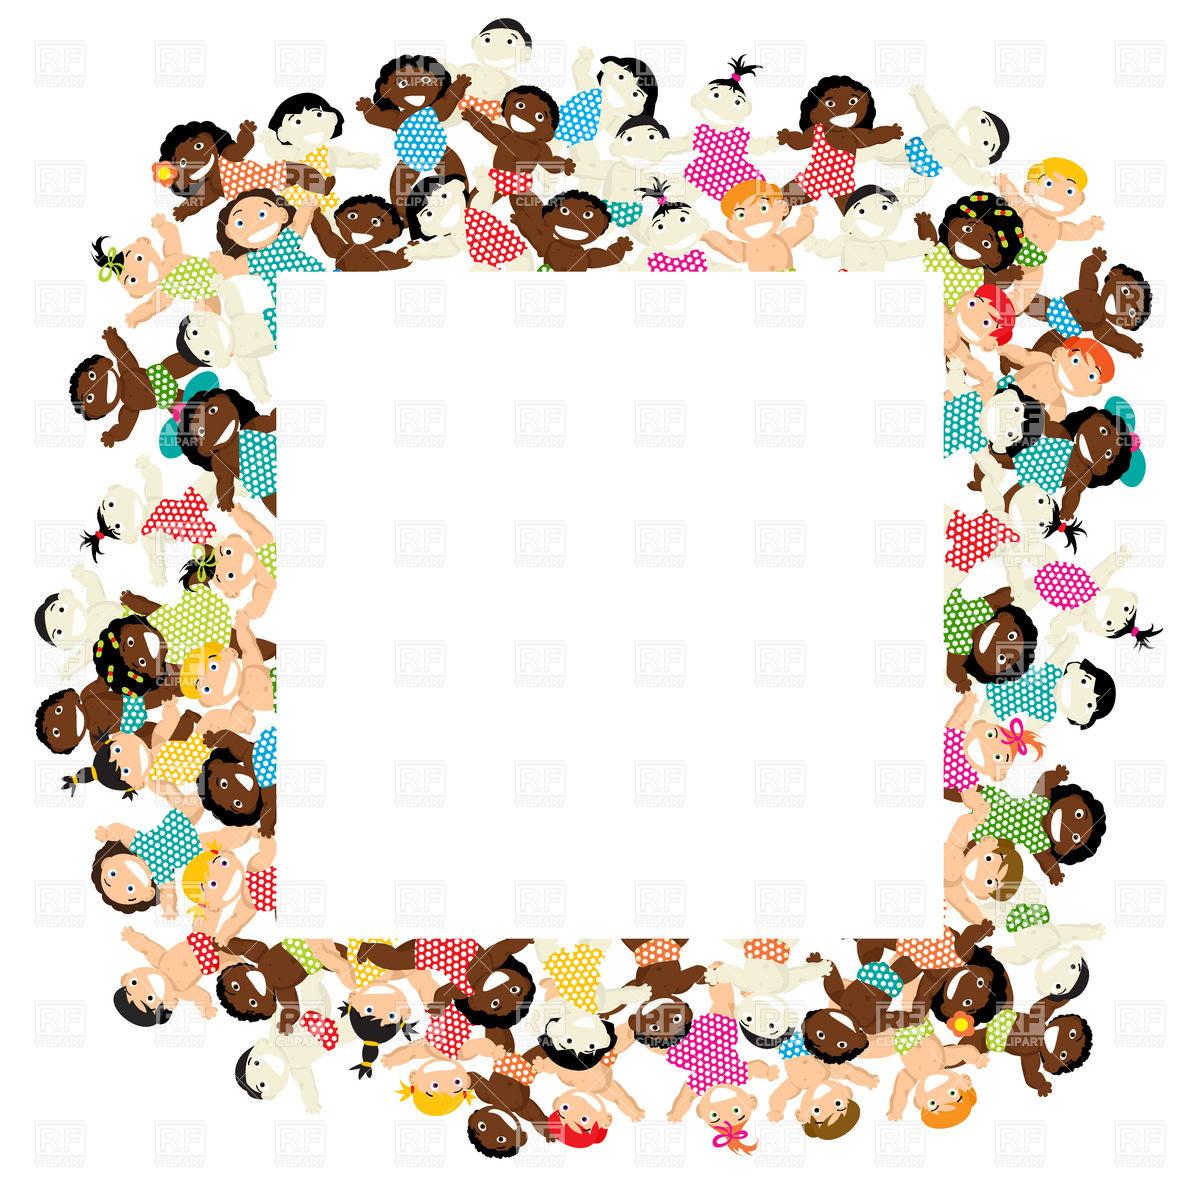 1200x1200 Decorative Frame With Multiethnic Children Vector Image Vector